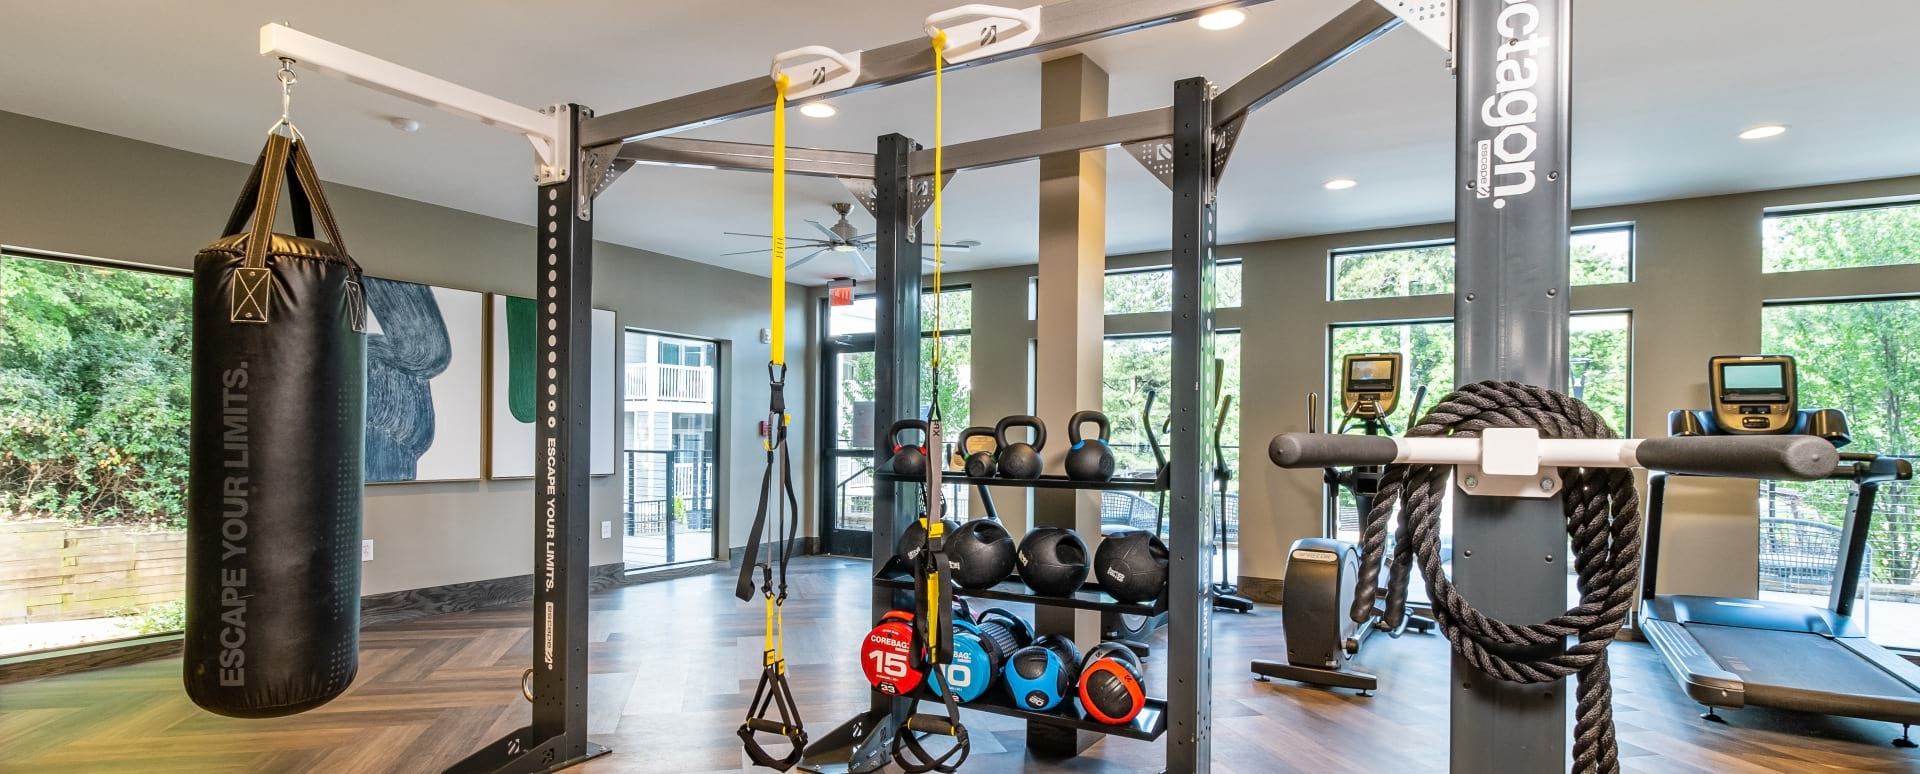 Fitness center at apartments in Marietta, GA